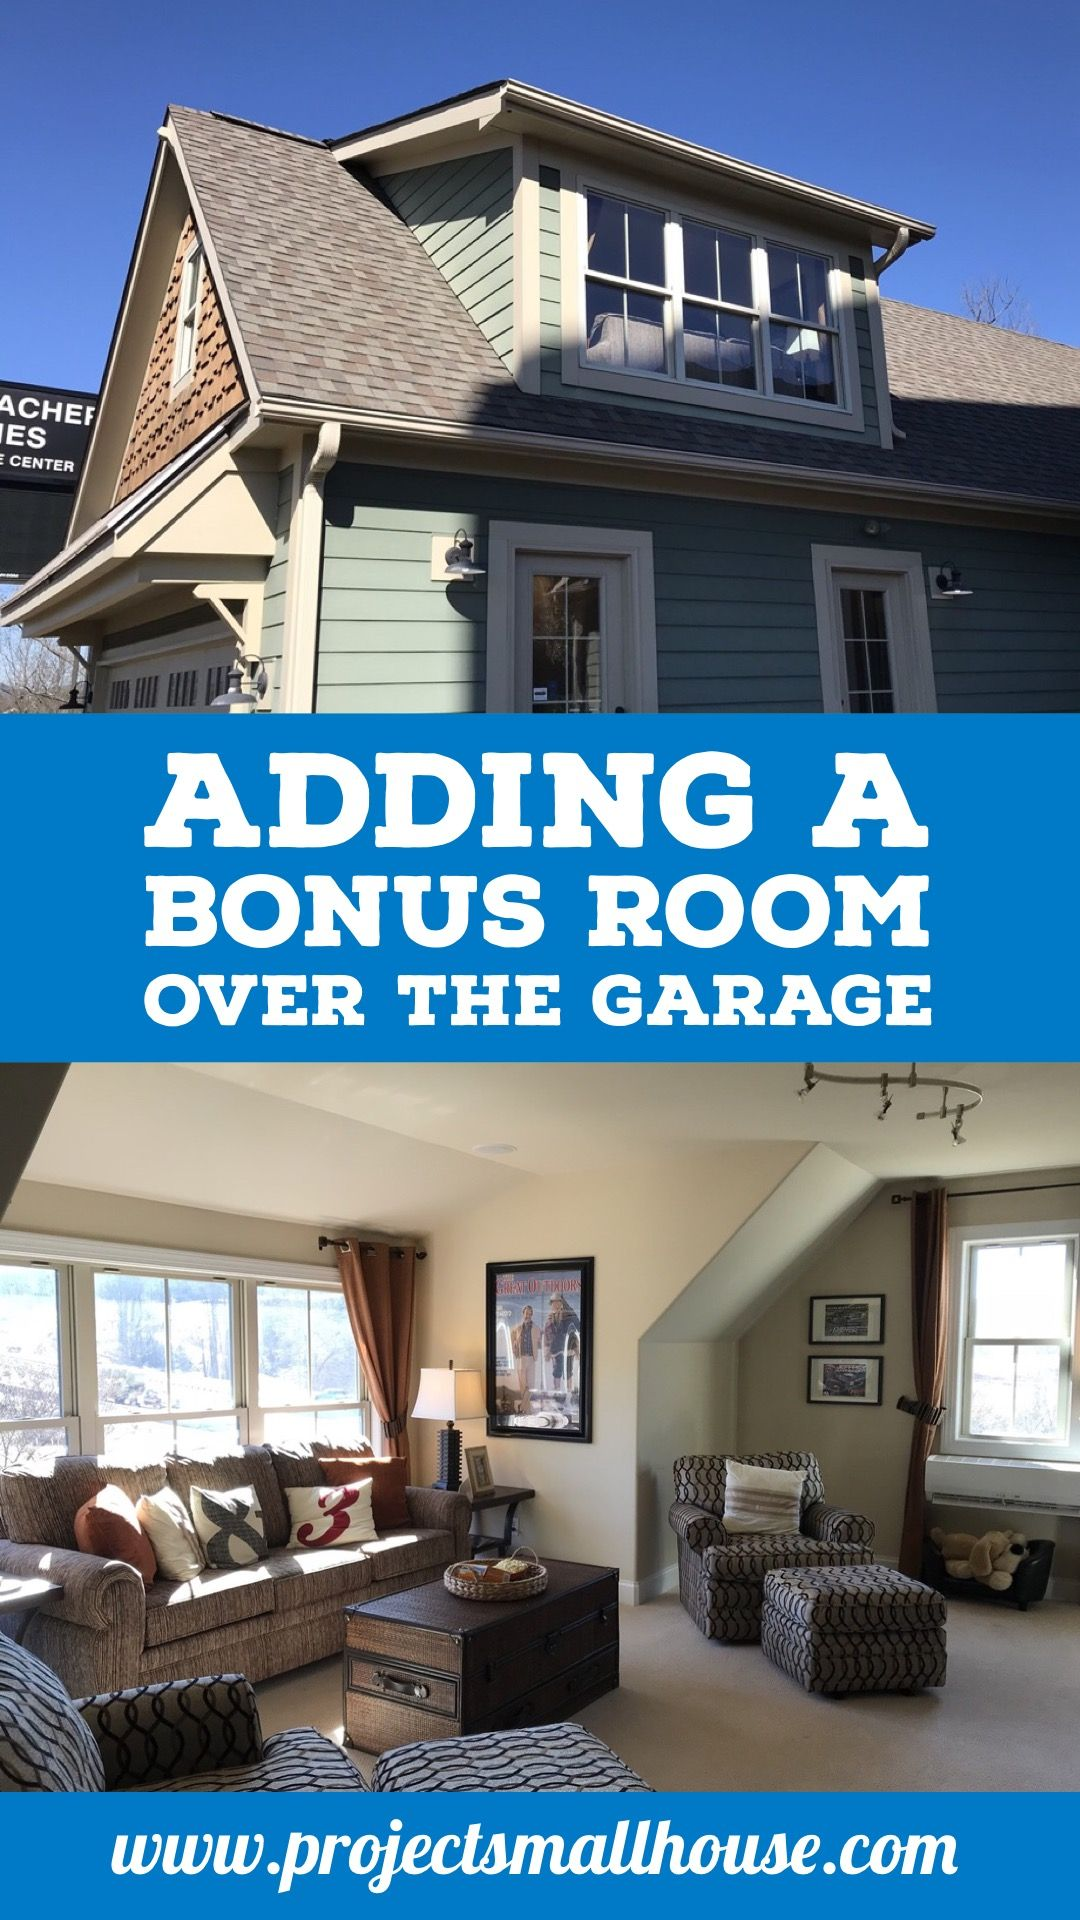 Adding A Bonus Room Over The Garage Project Small House Room Above Garage Garage Room Garage Floor Plans